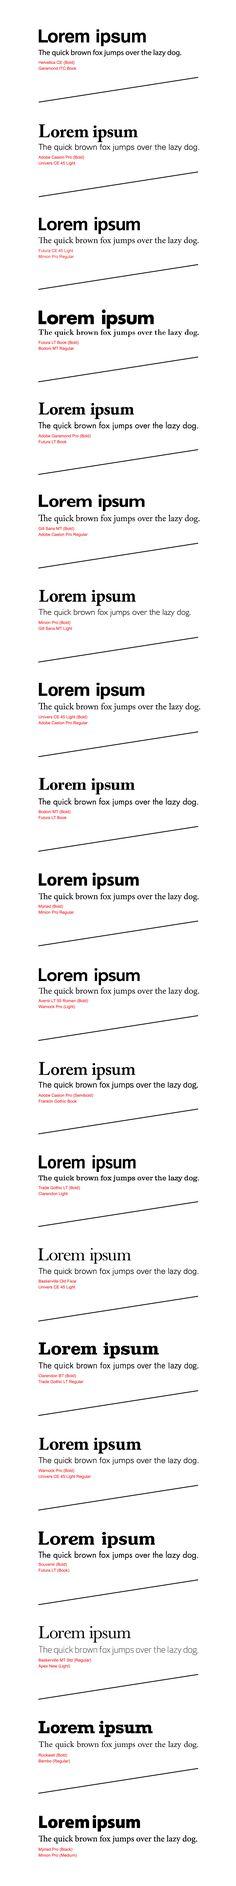 Best Fonts And Font Combinations, PART 3